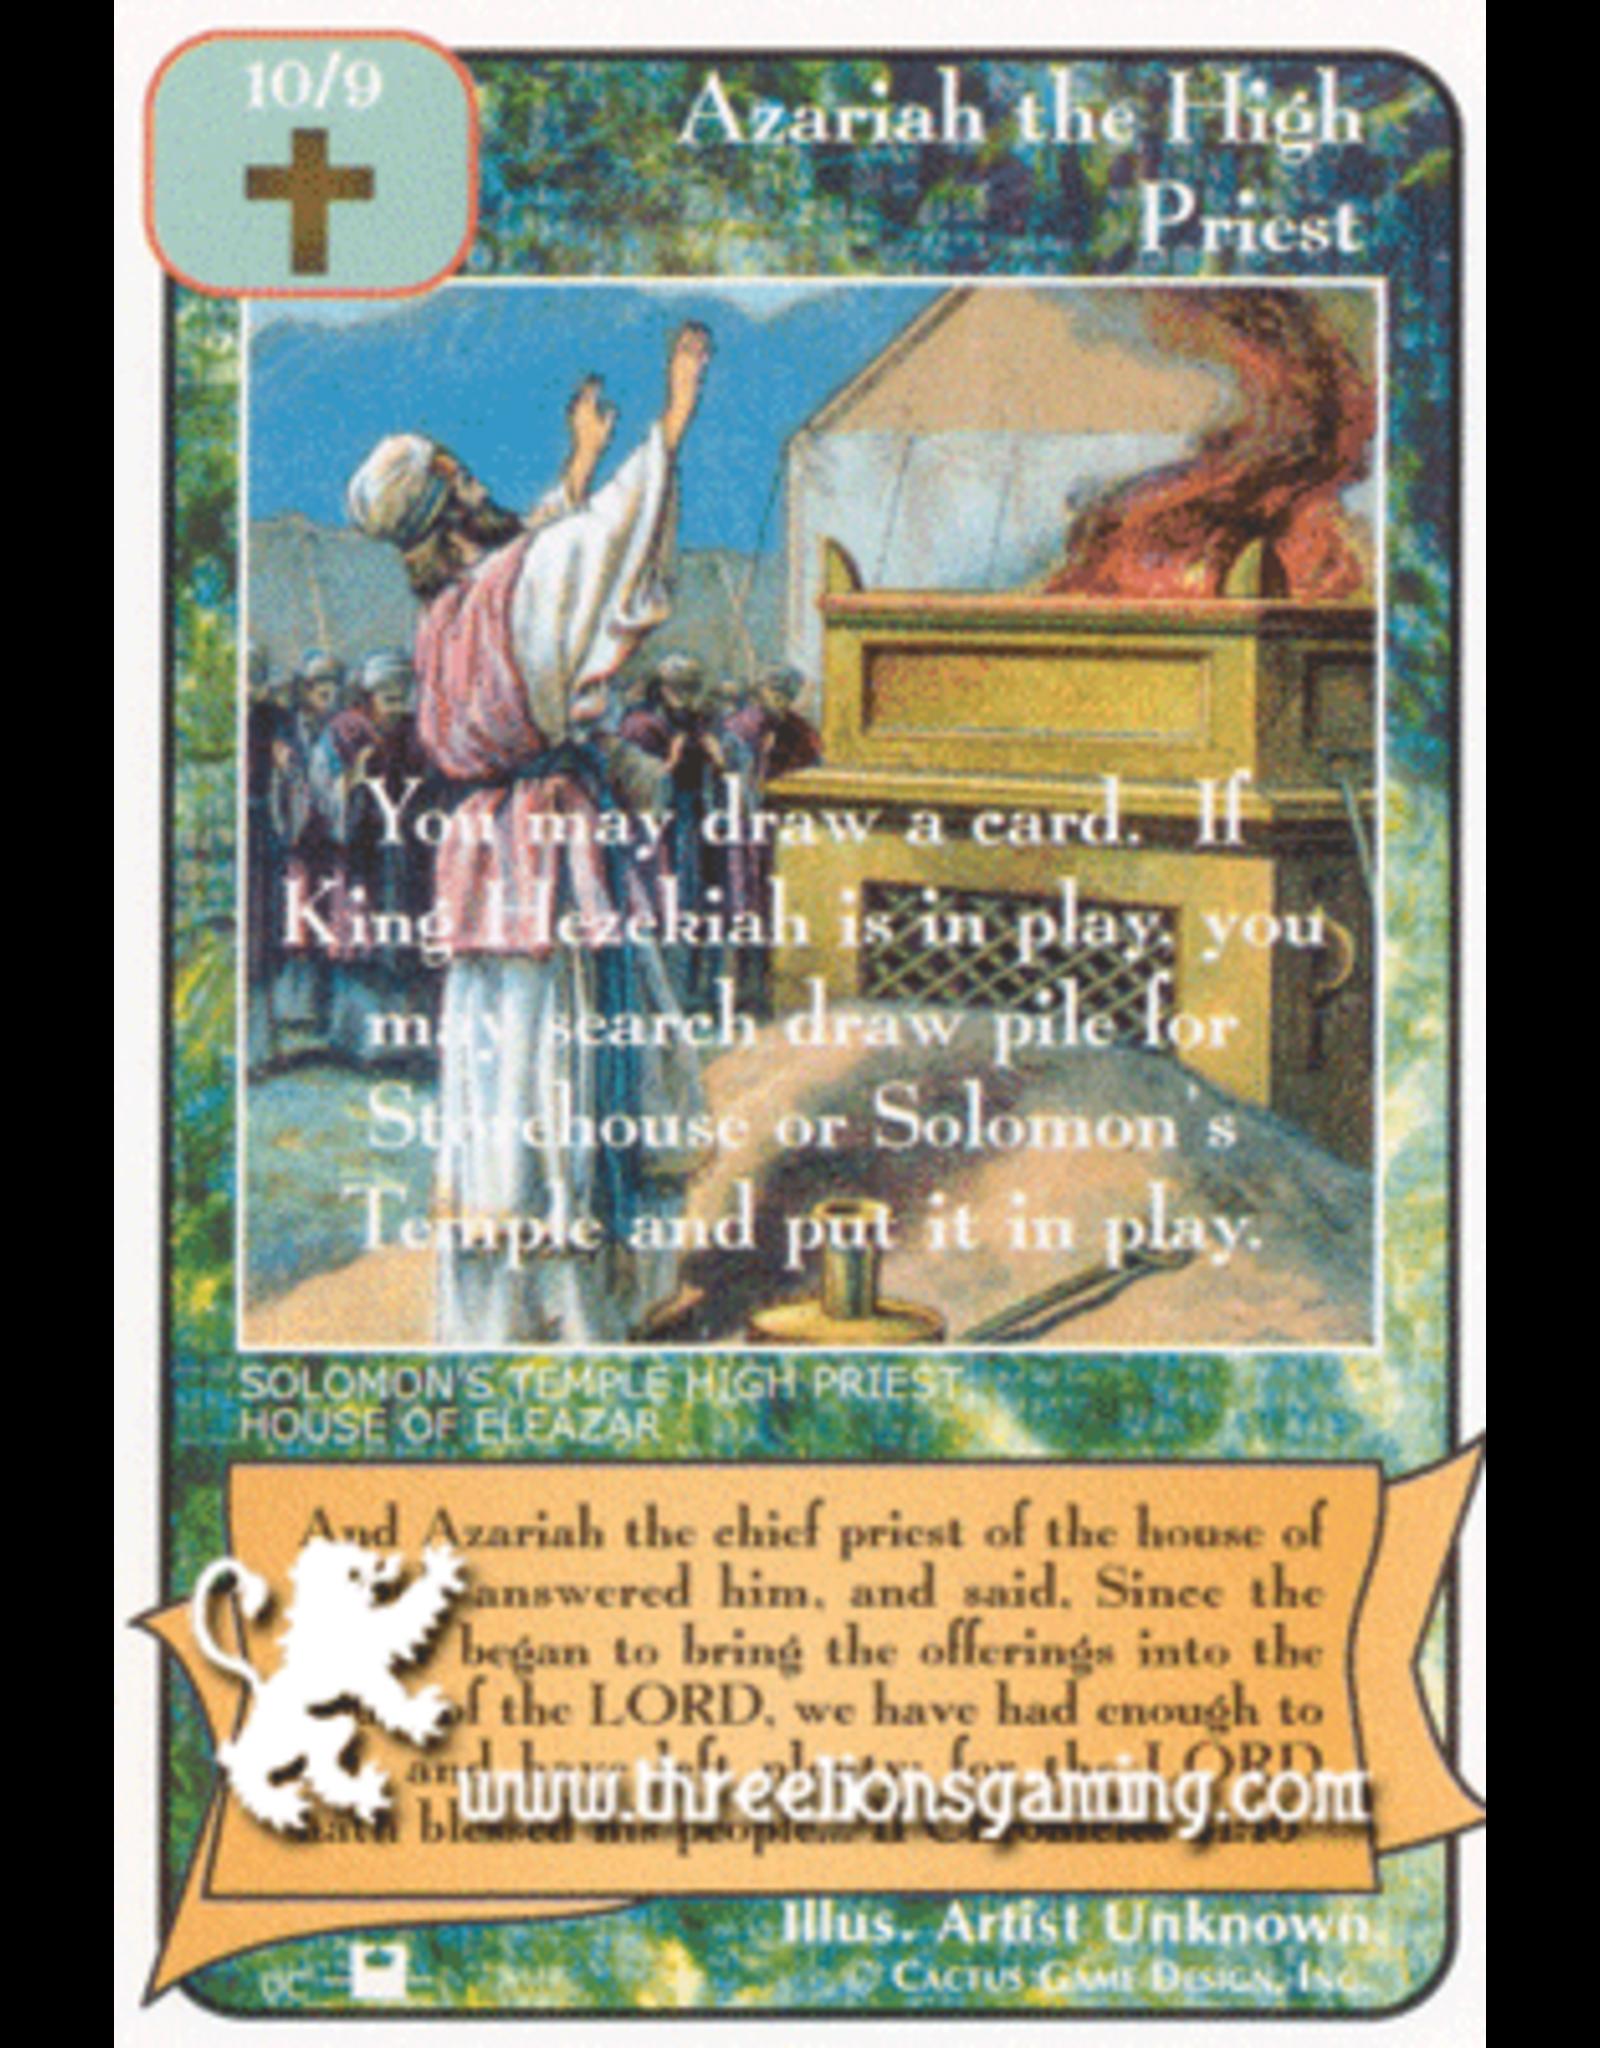 Priests: Azariah the High Priest